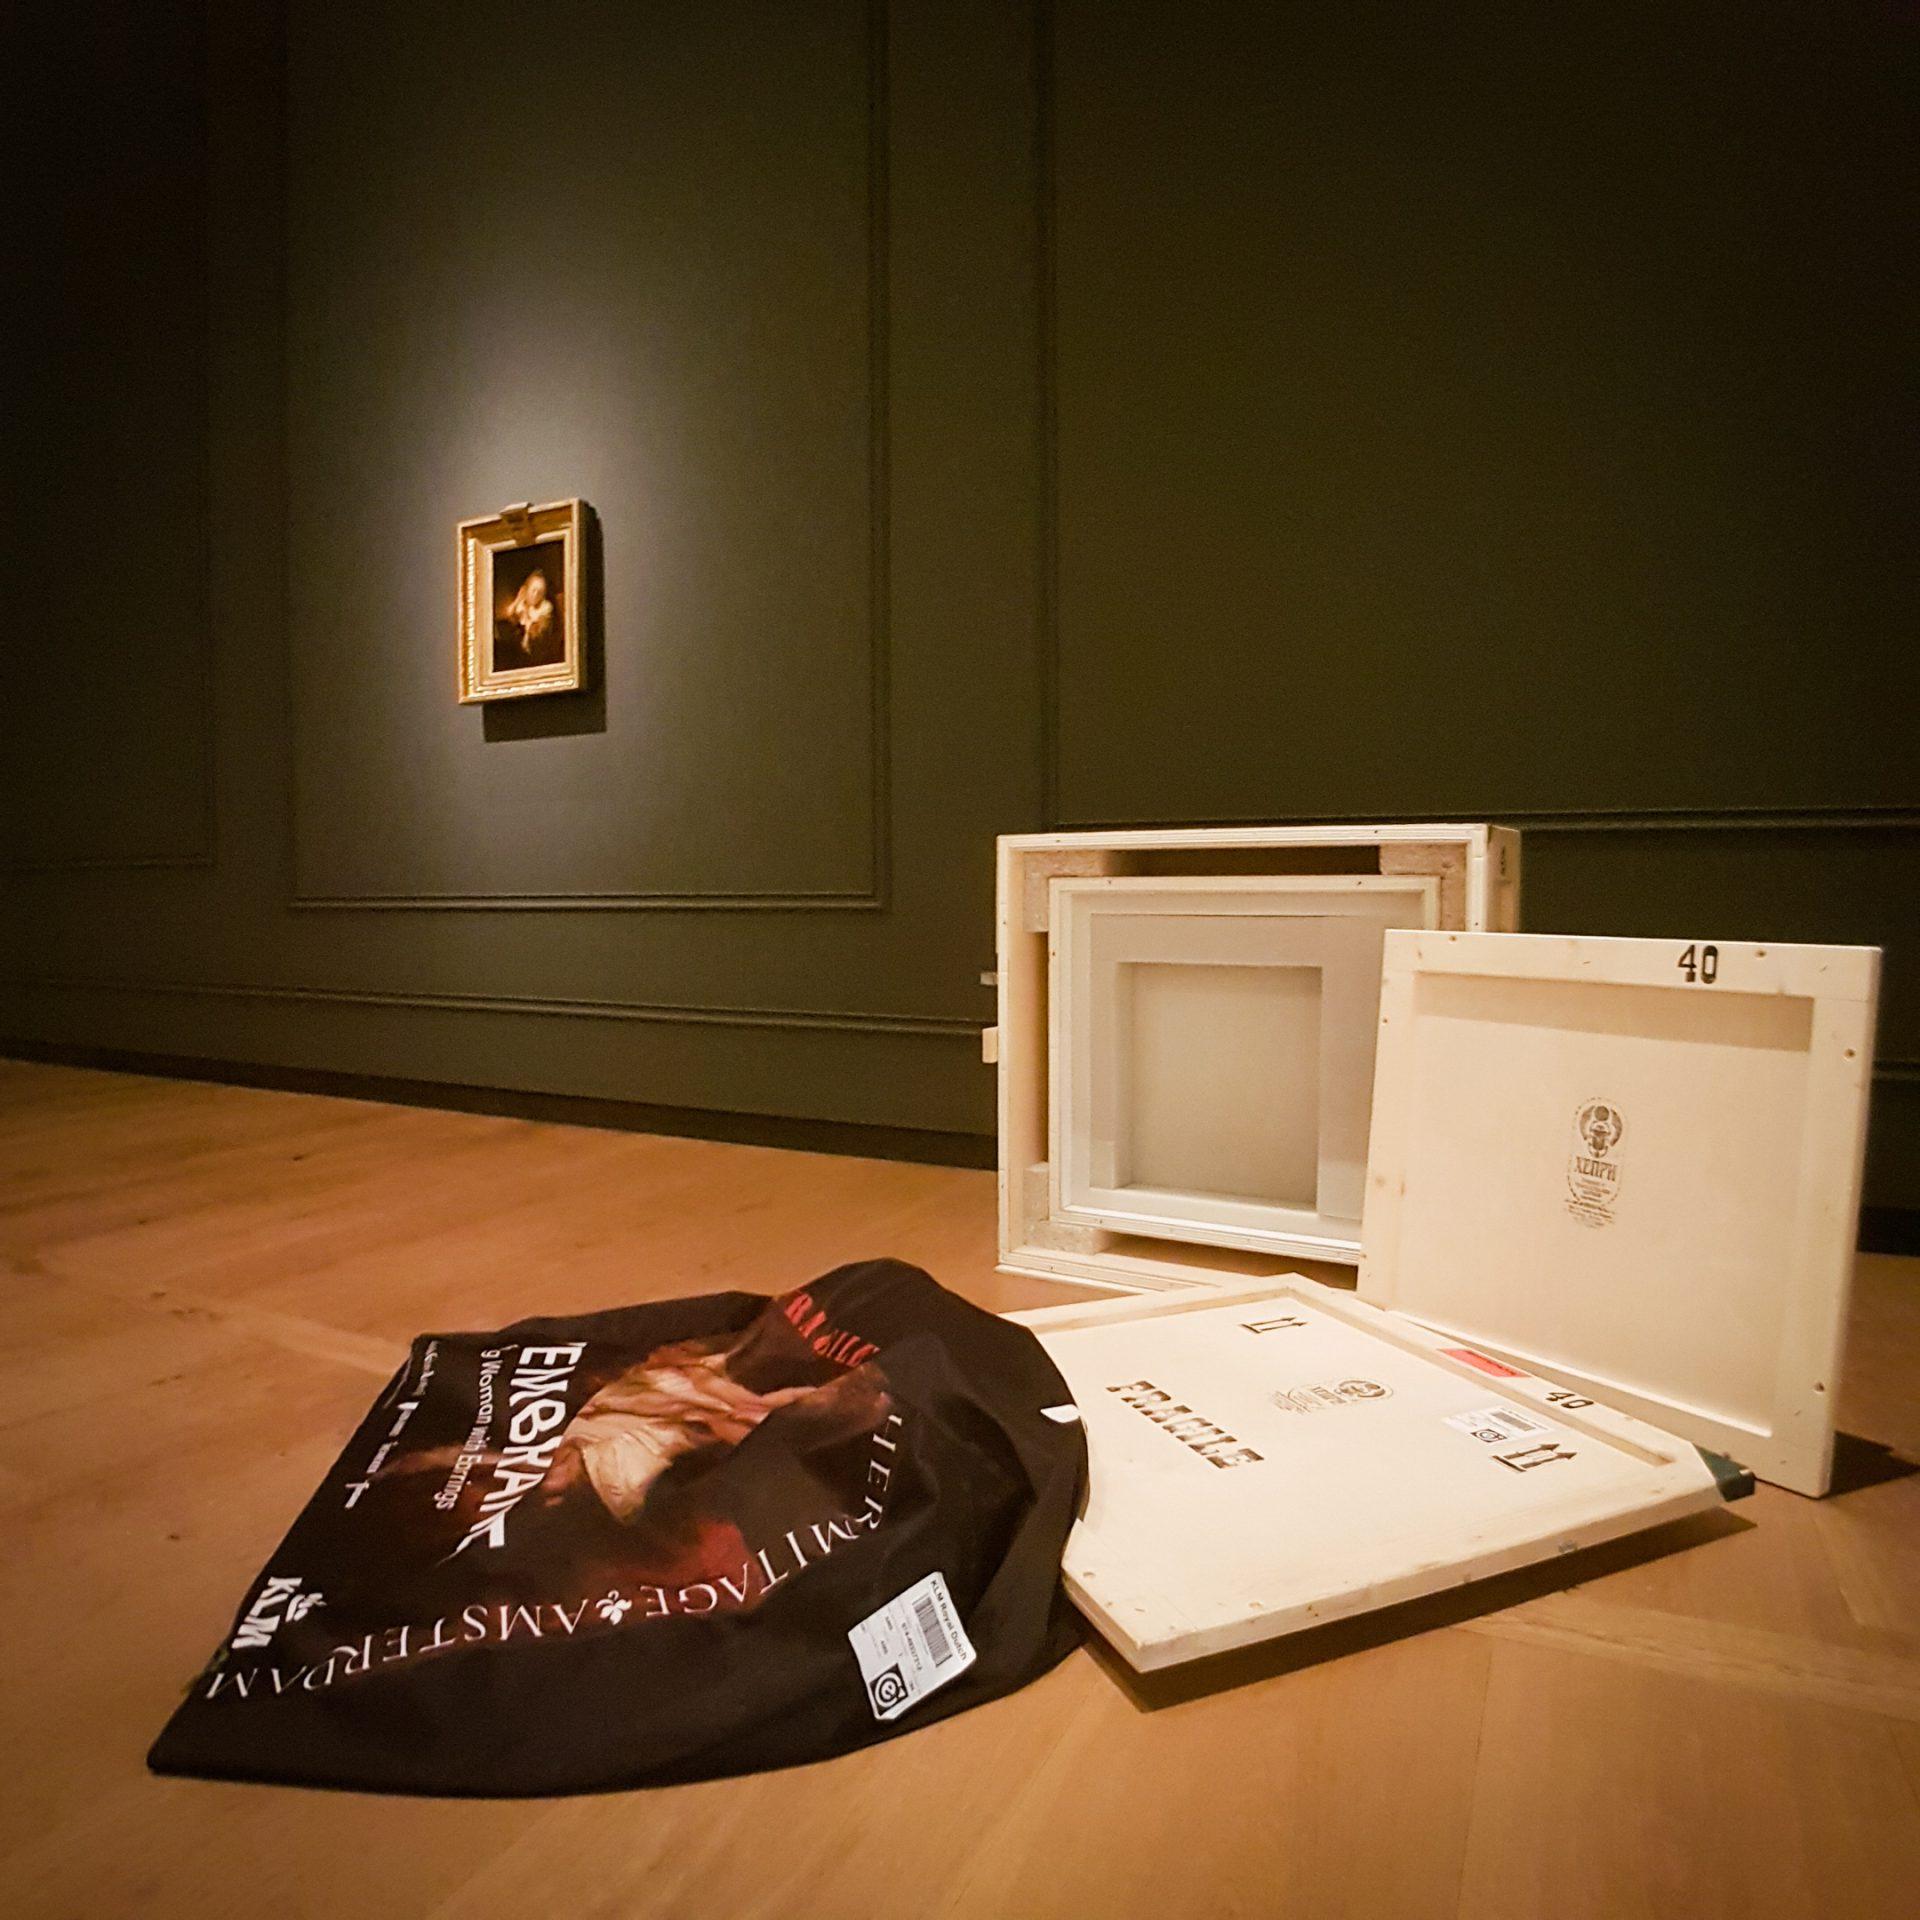 Unboxing Rembrandt